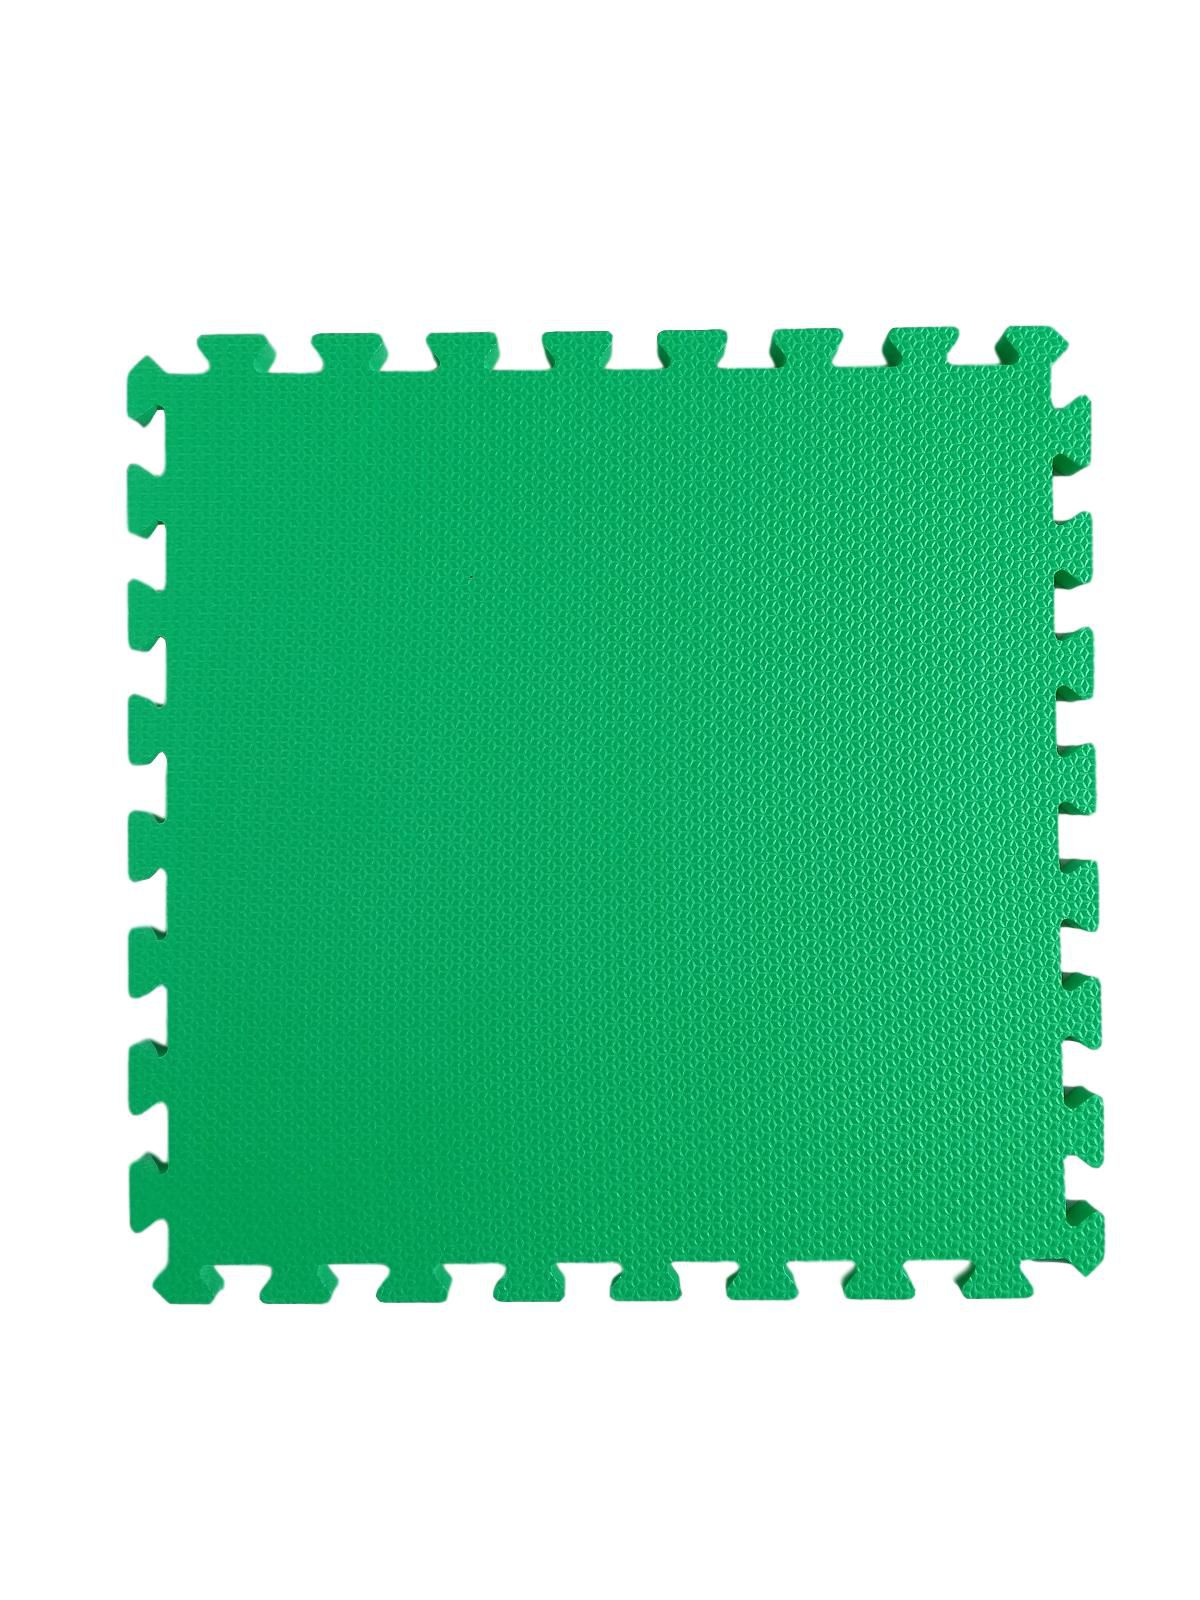 Kit 16 Tapetes Tatames Coloridos Eva 50cm X 50cm X 15mm C/ Borda